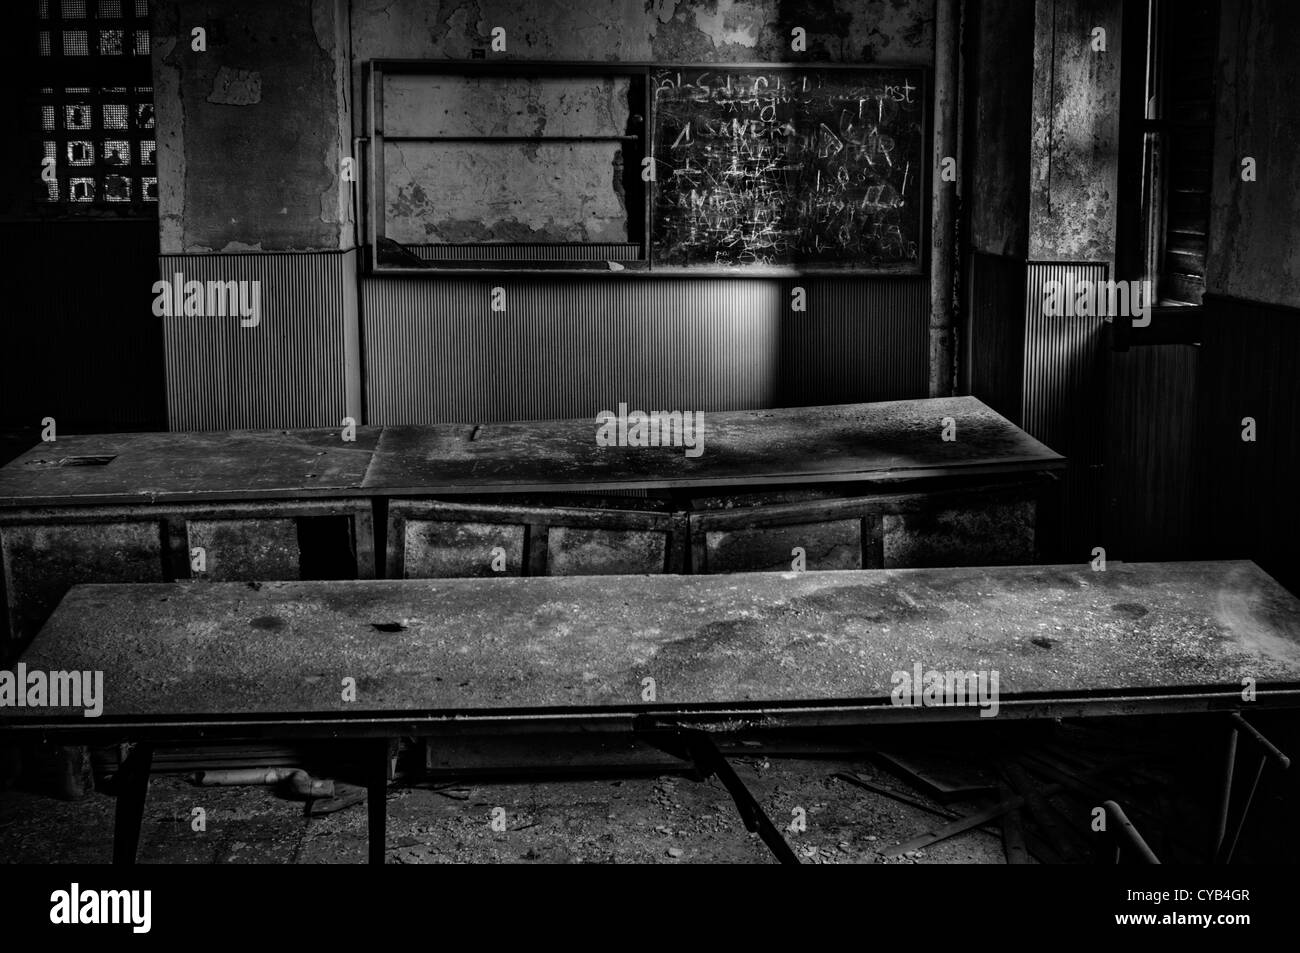 Italia. Ruinas de aula en escuela abandonada Imagen De Stock